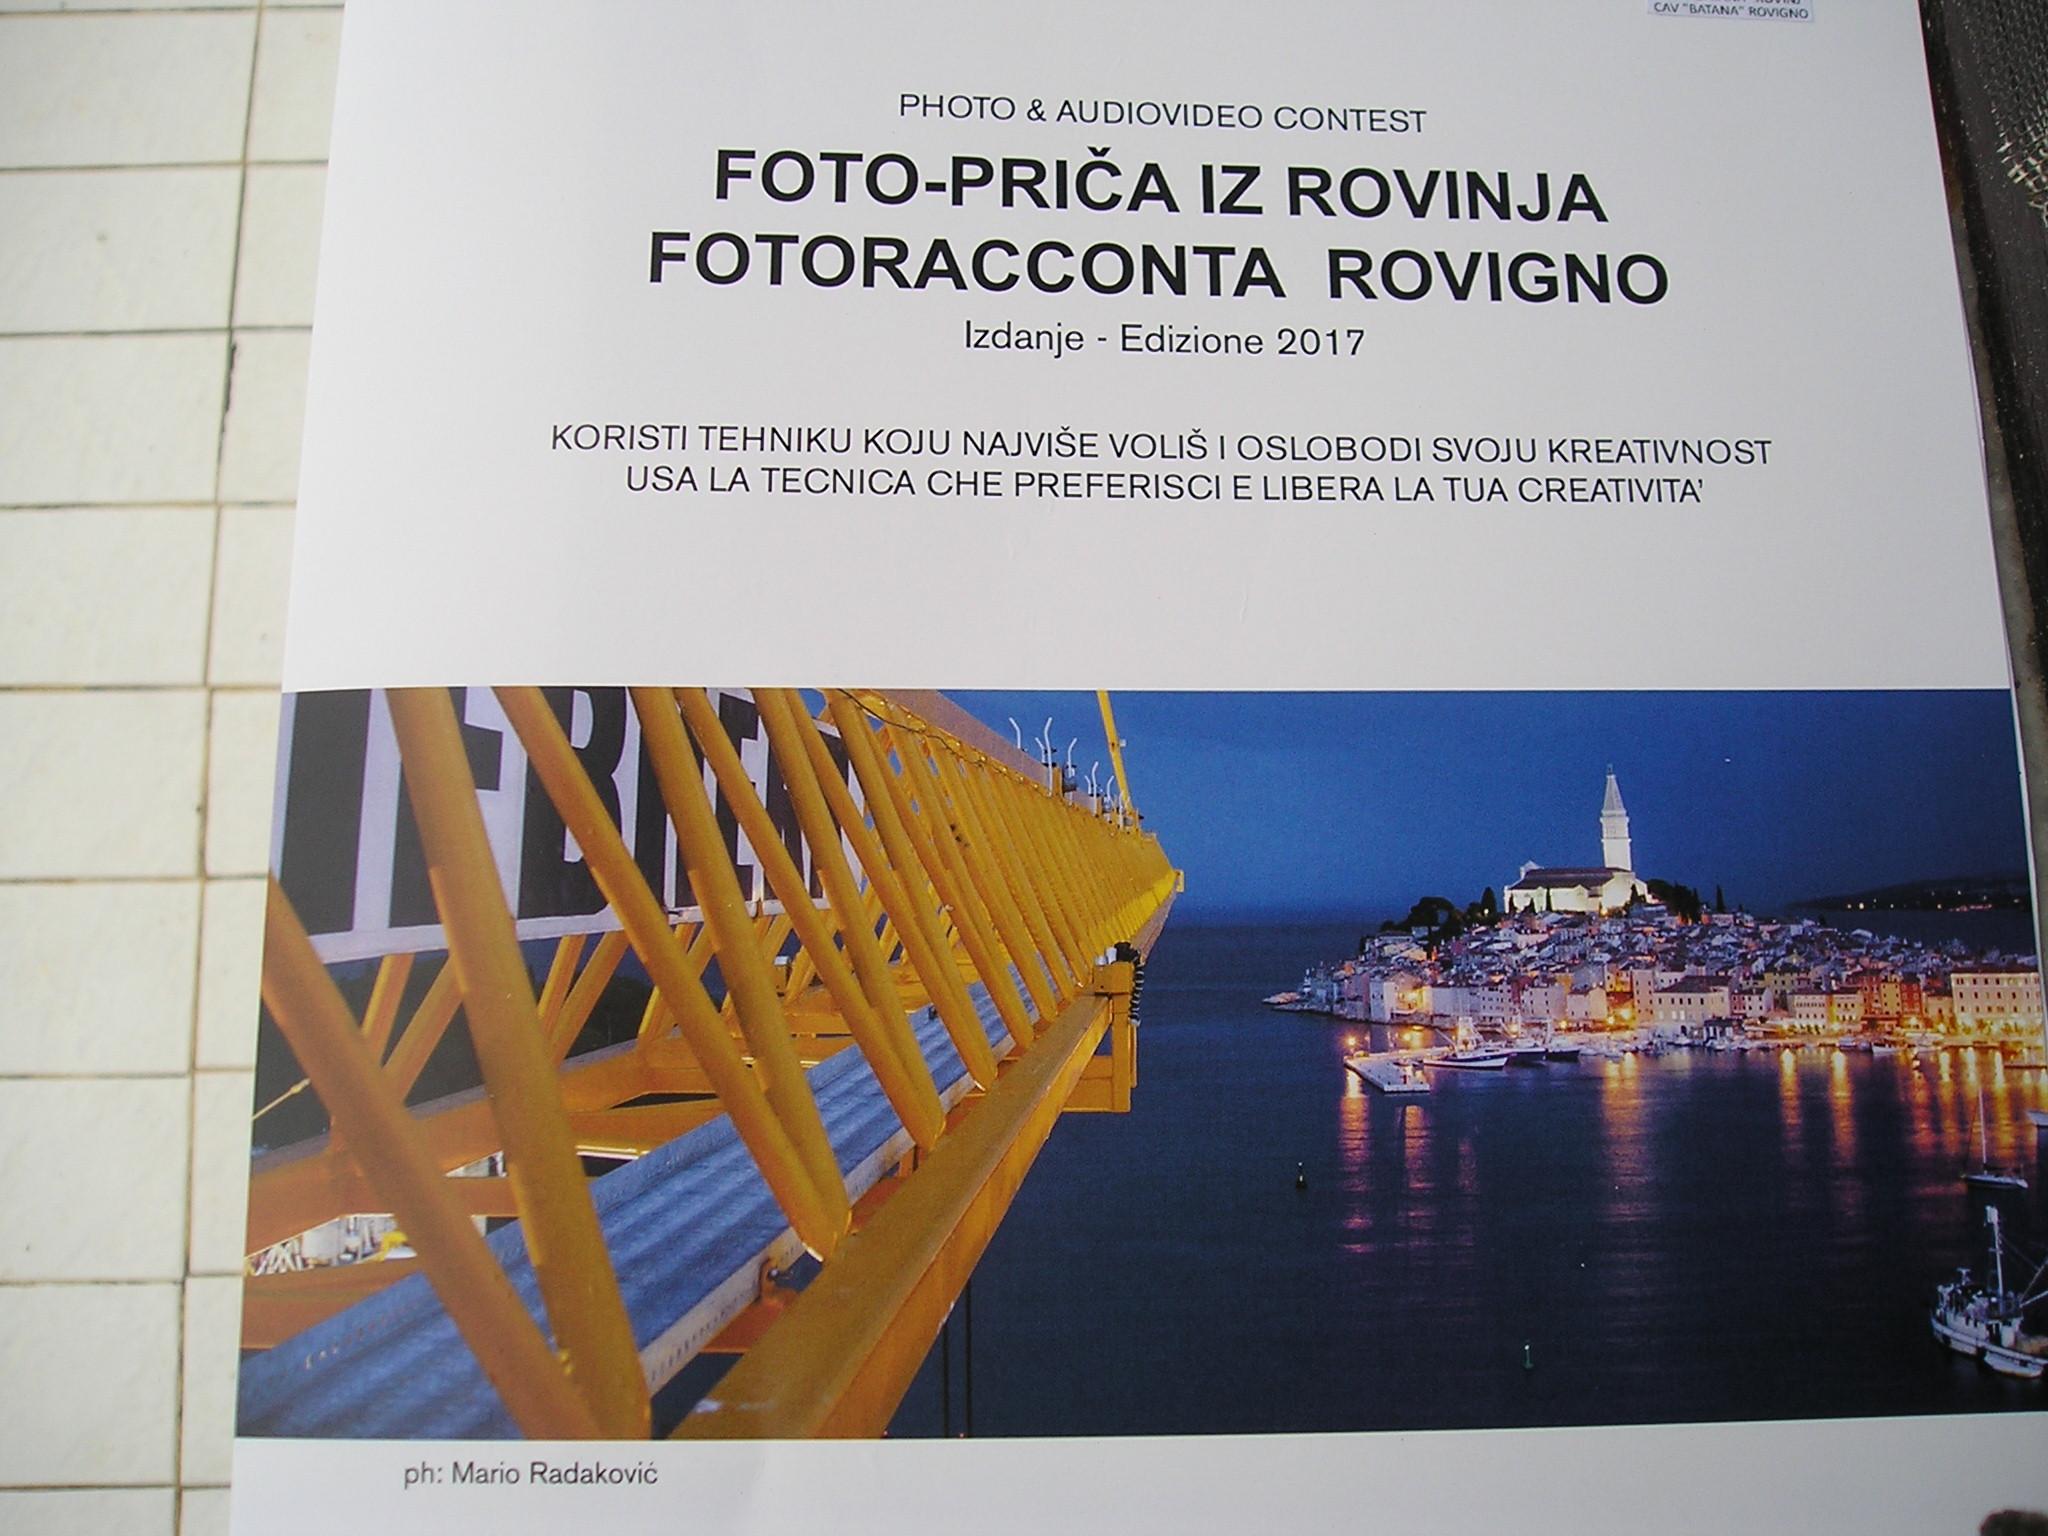 Fotoracconta Rovigno